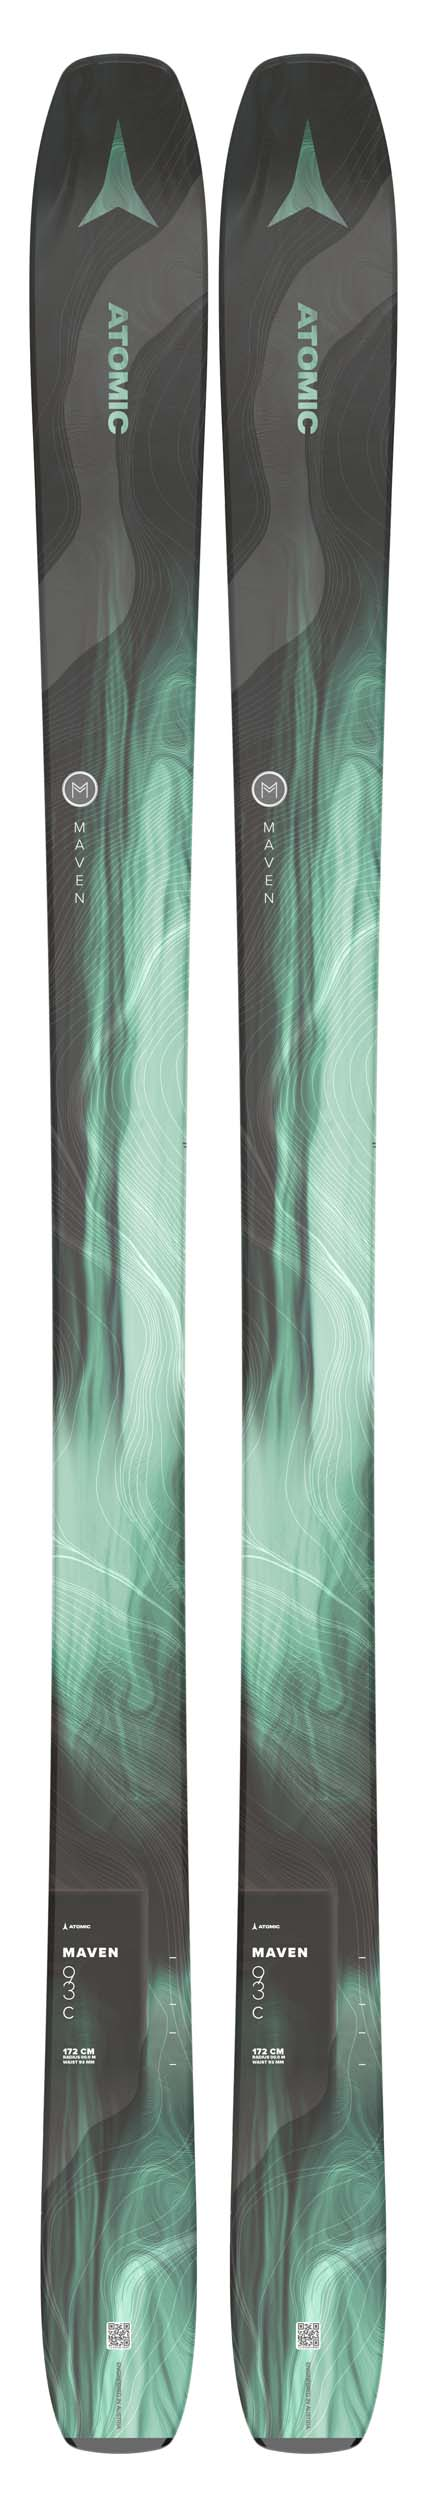 Atomic 2022 Maven 93 C Skis (Without Bindings / Flat) NEW !! 164cm